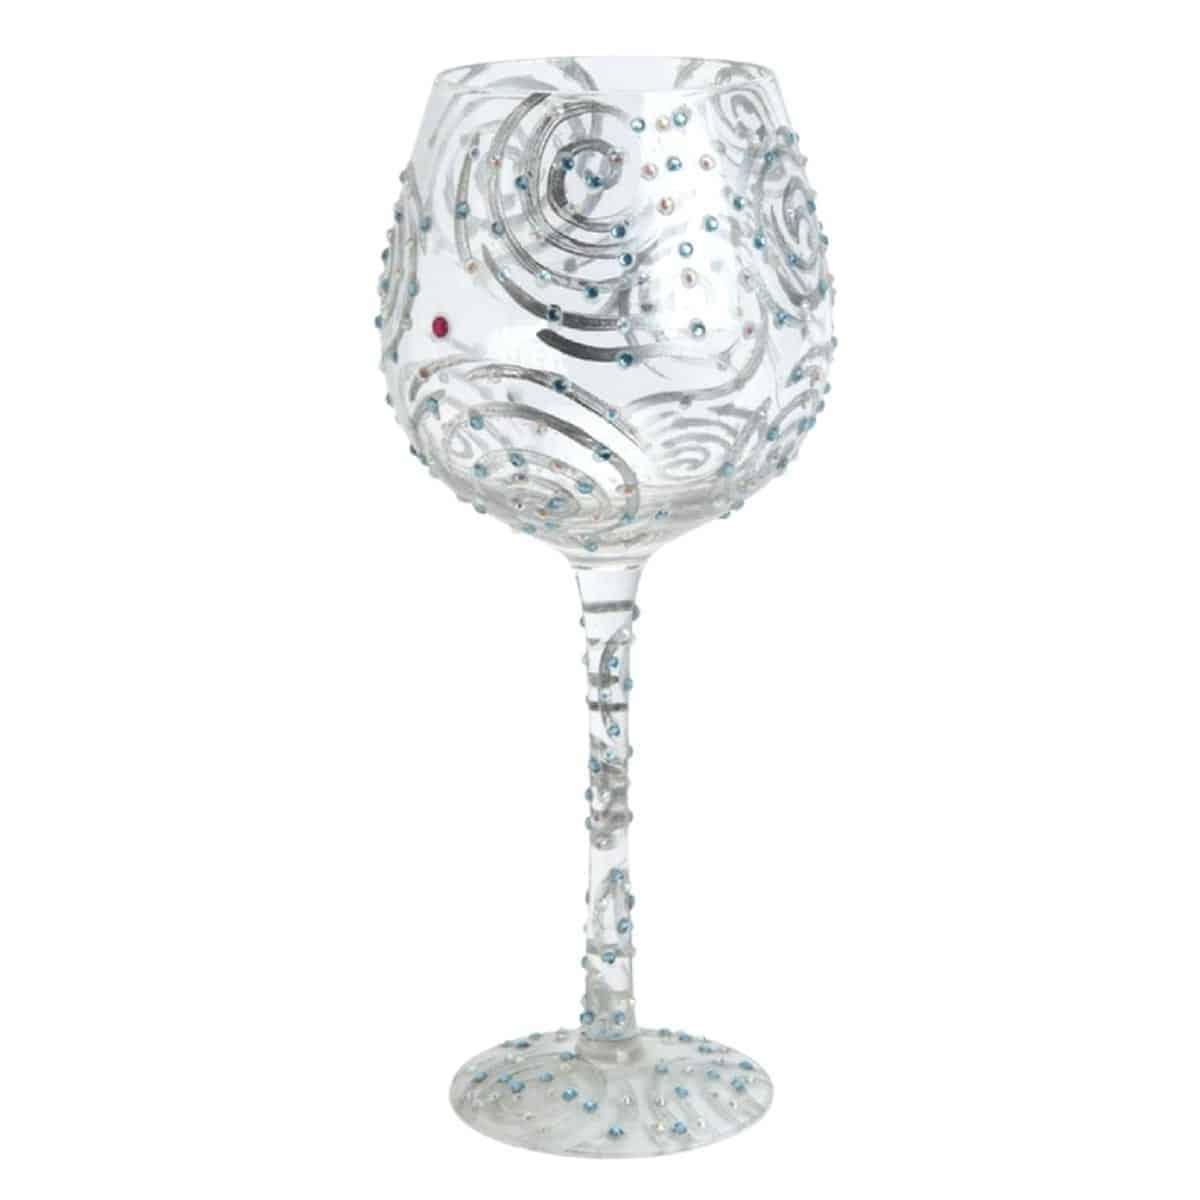 Lolita from enesco wine glass